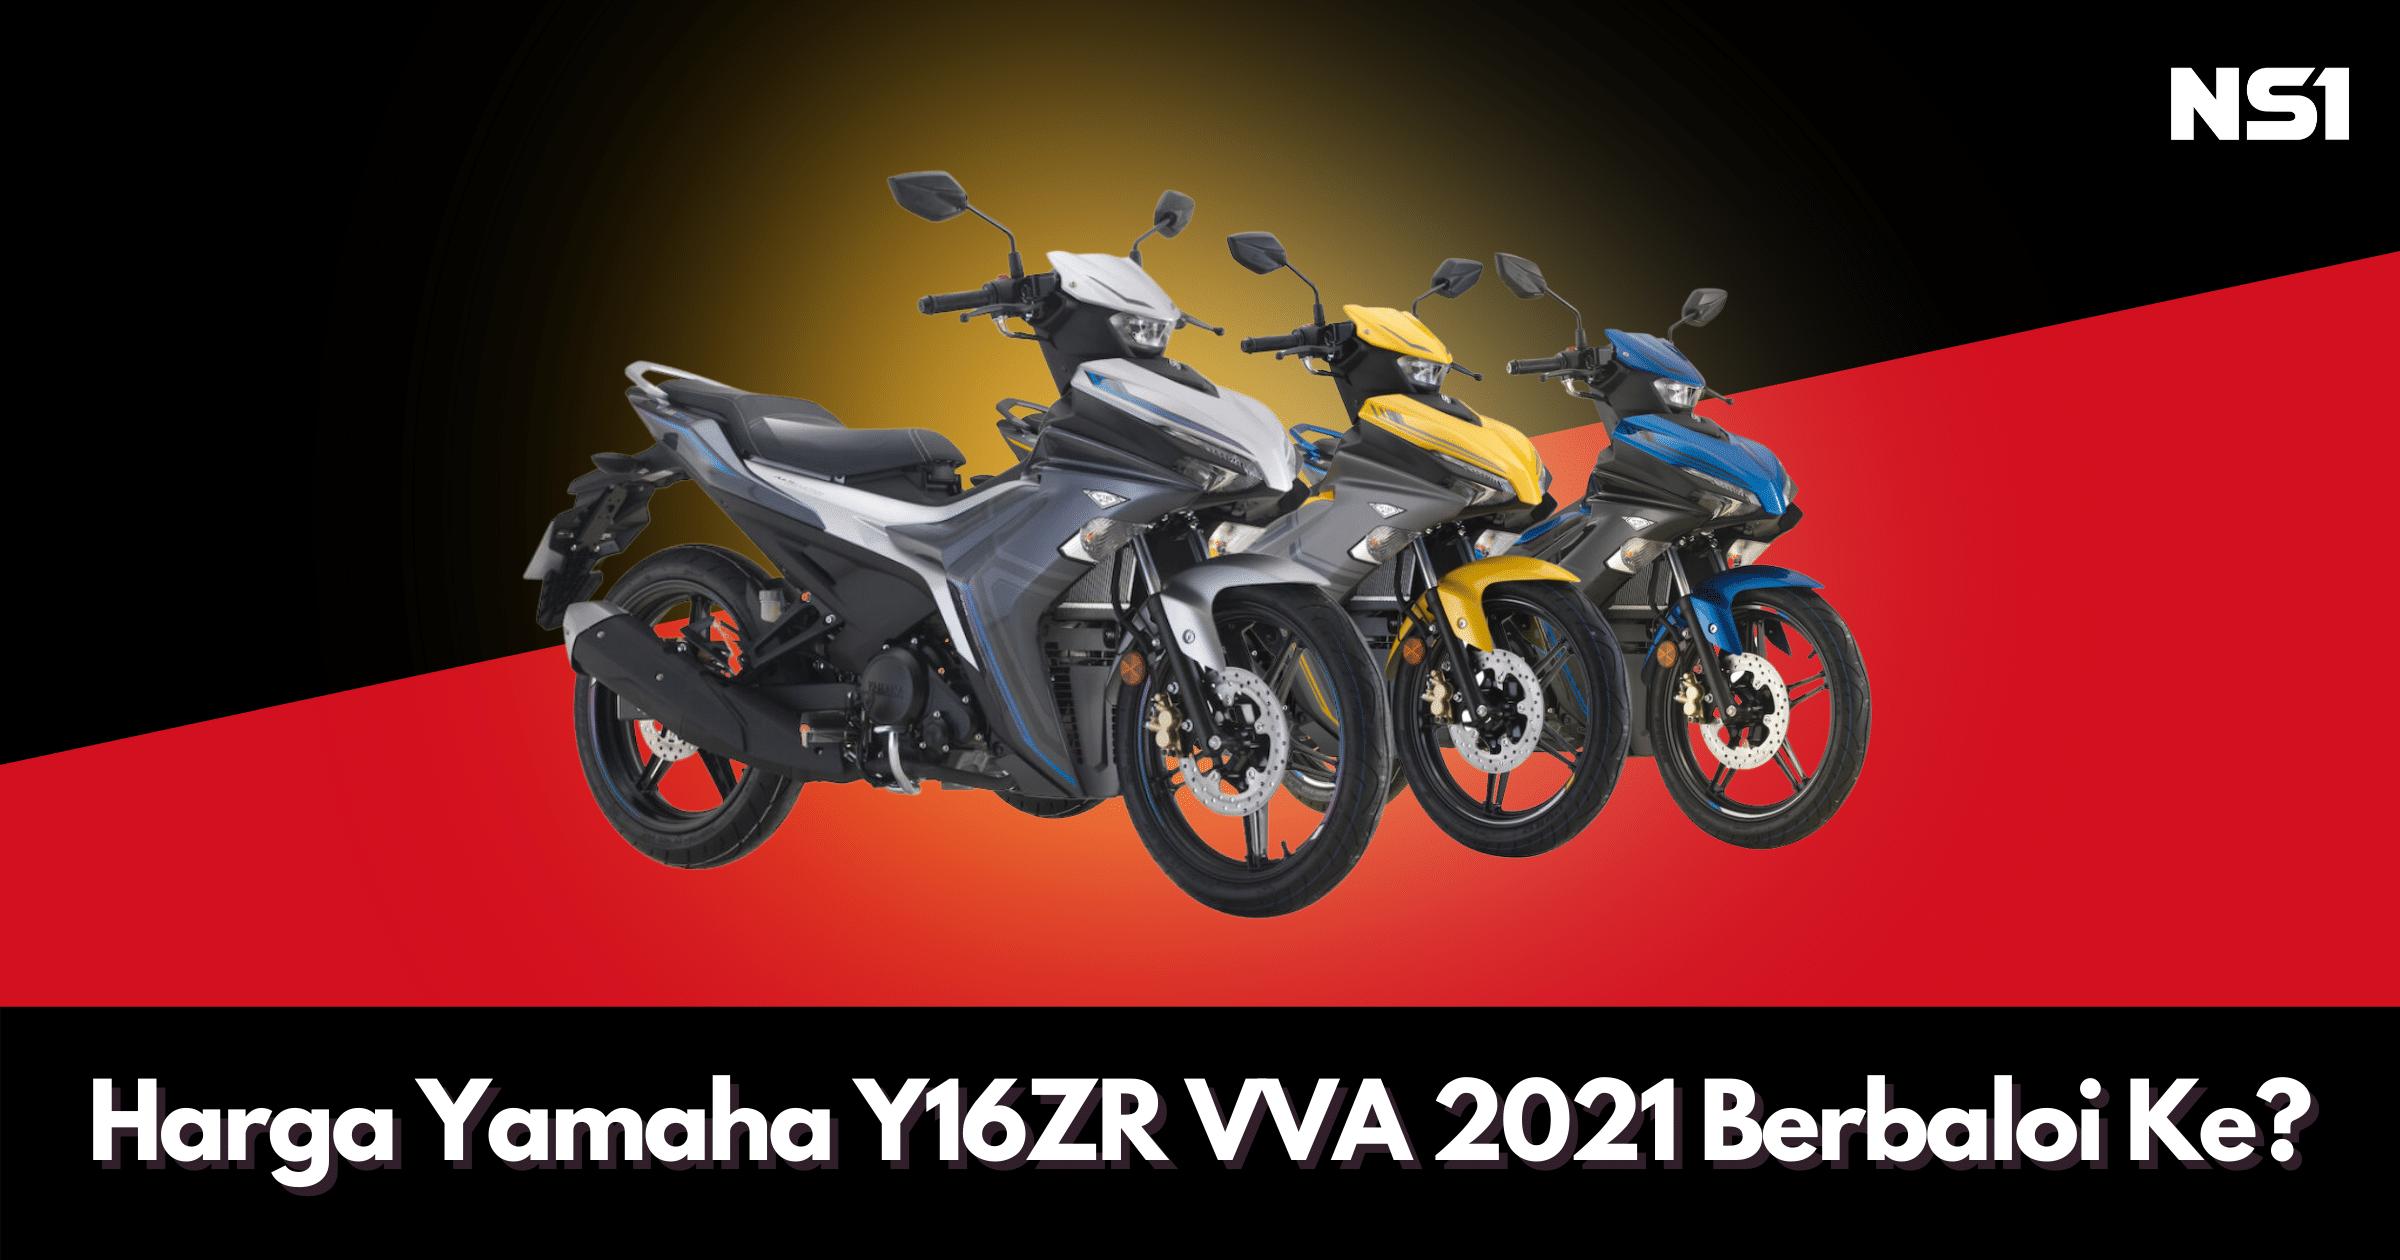 Harga Yamaha Y16ZR VVA mula RM10,888